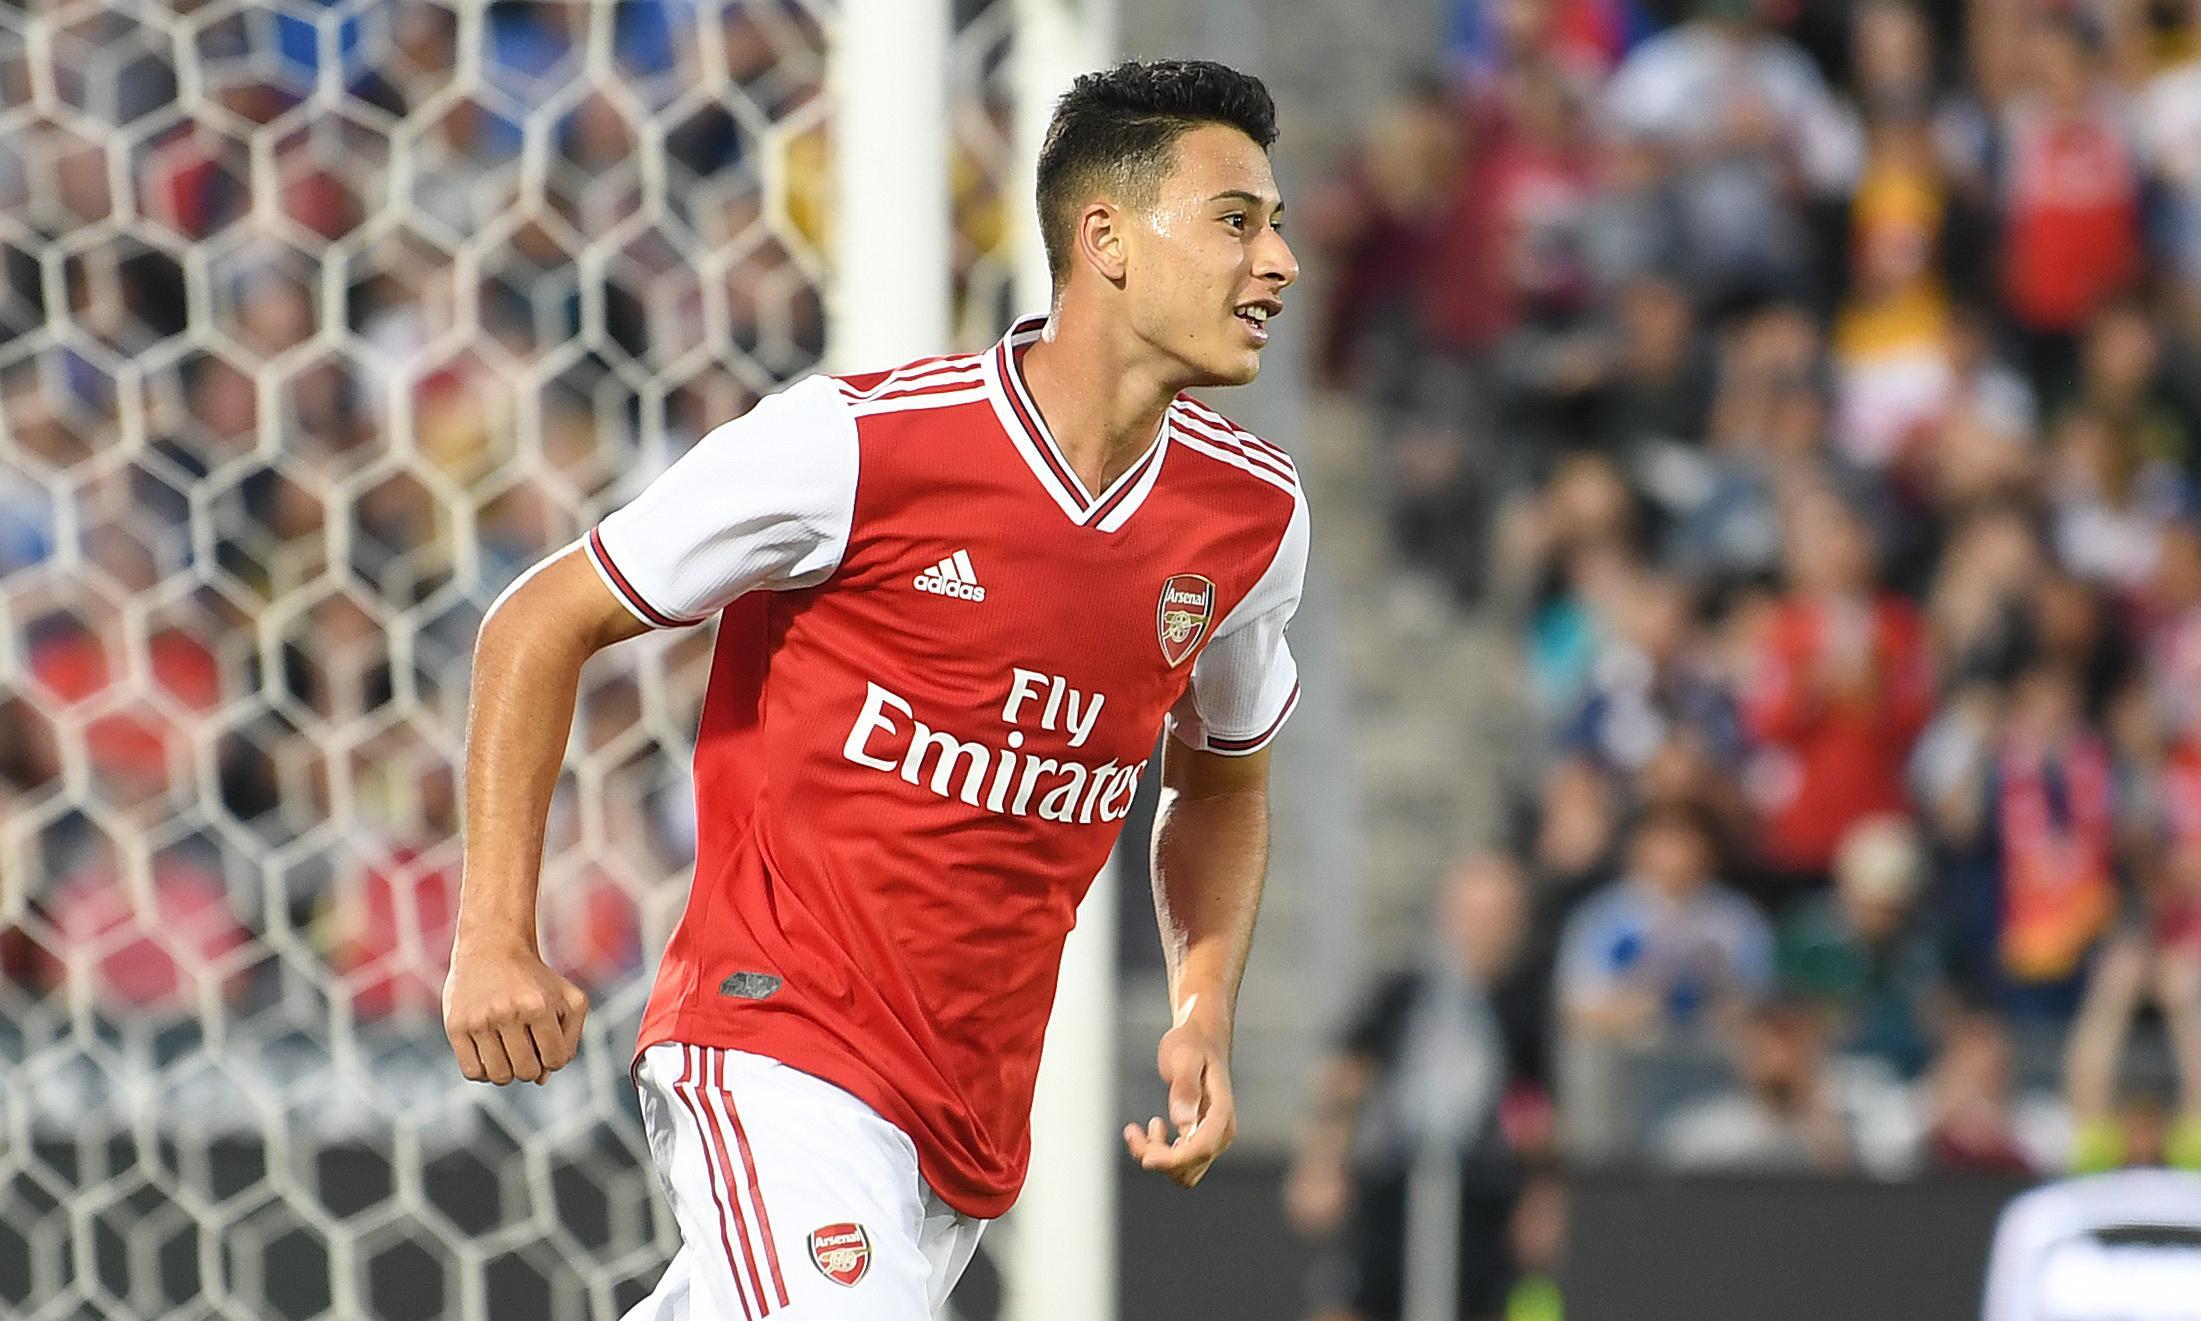 Emery says Arsenal and Koscielny 'need to speak' as Martinelli scores on debut